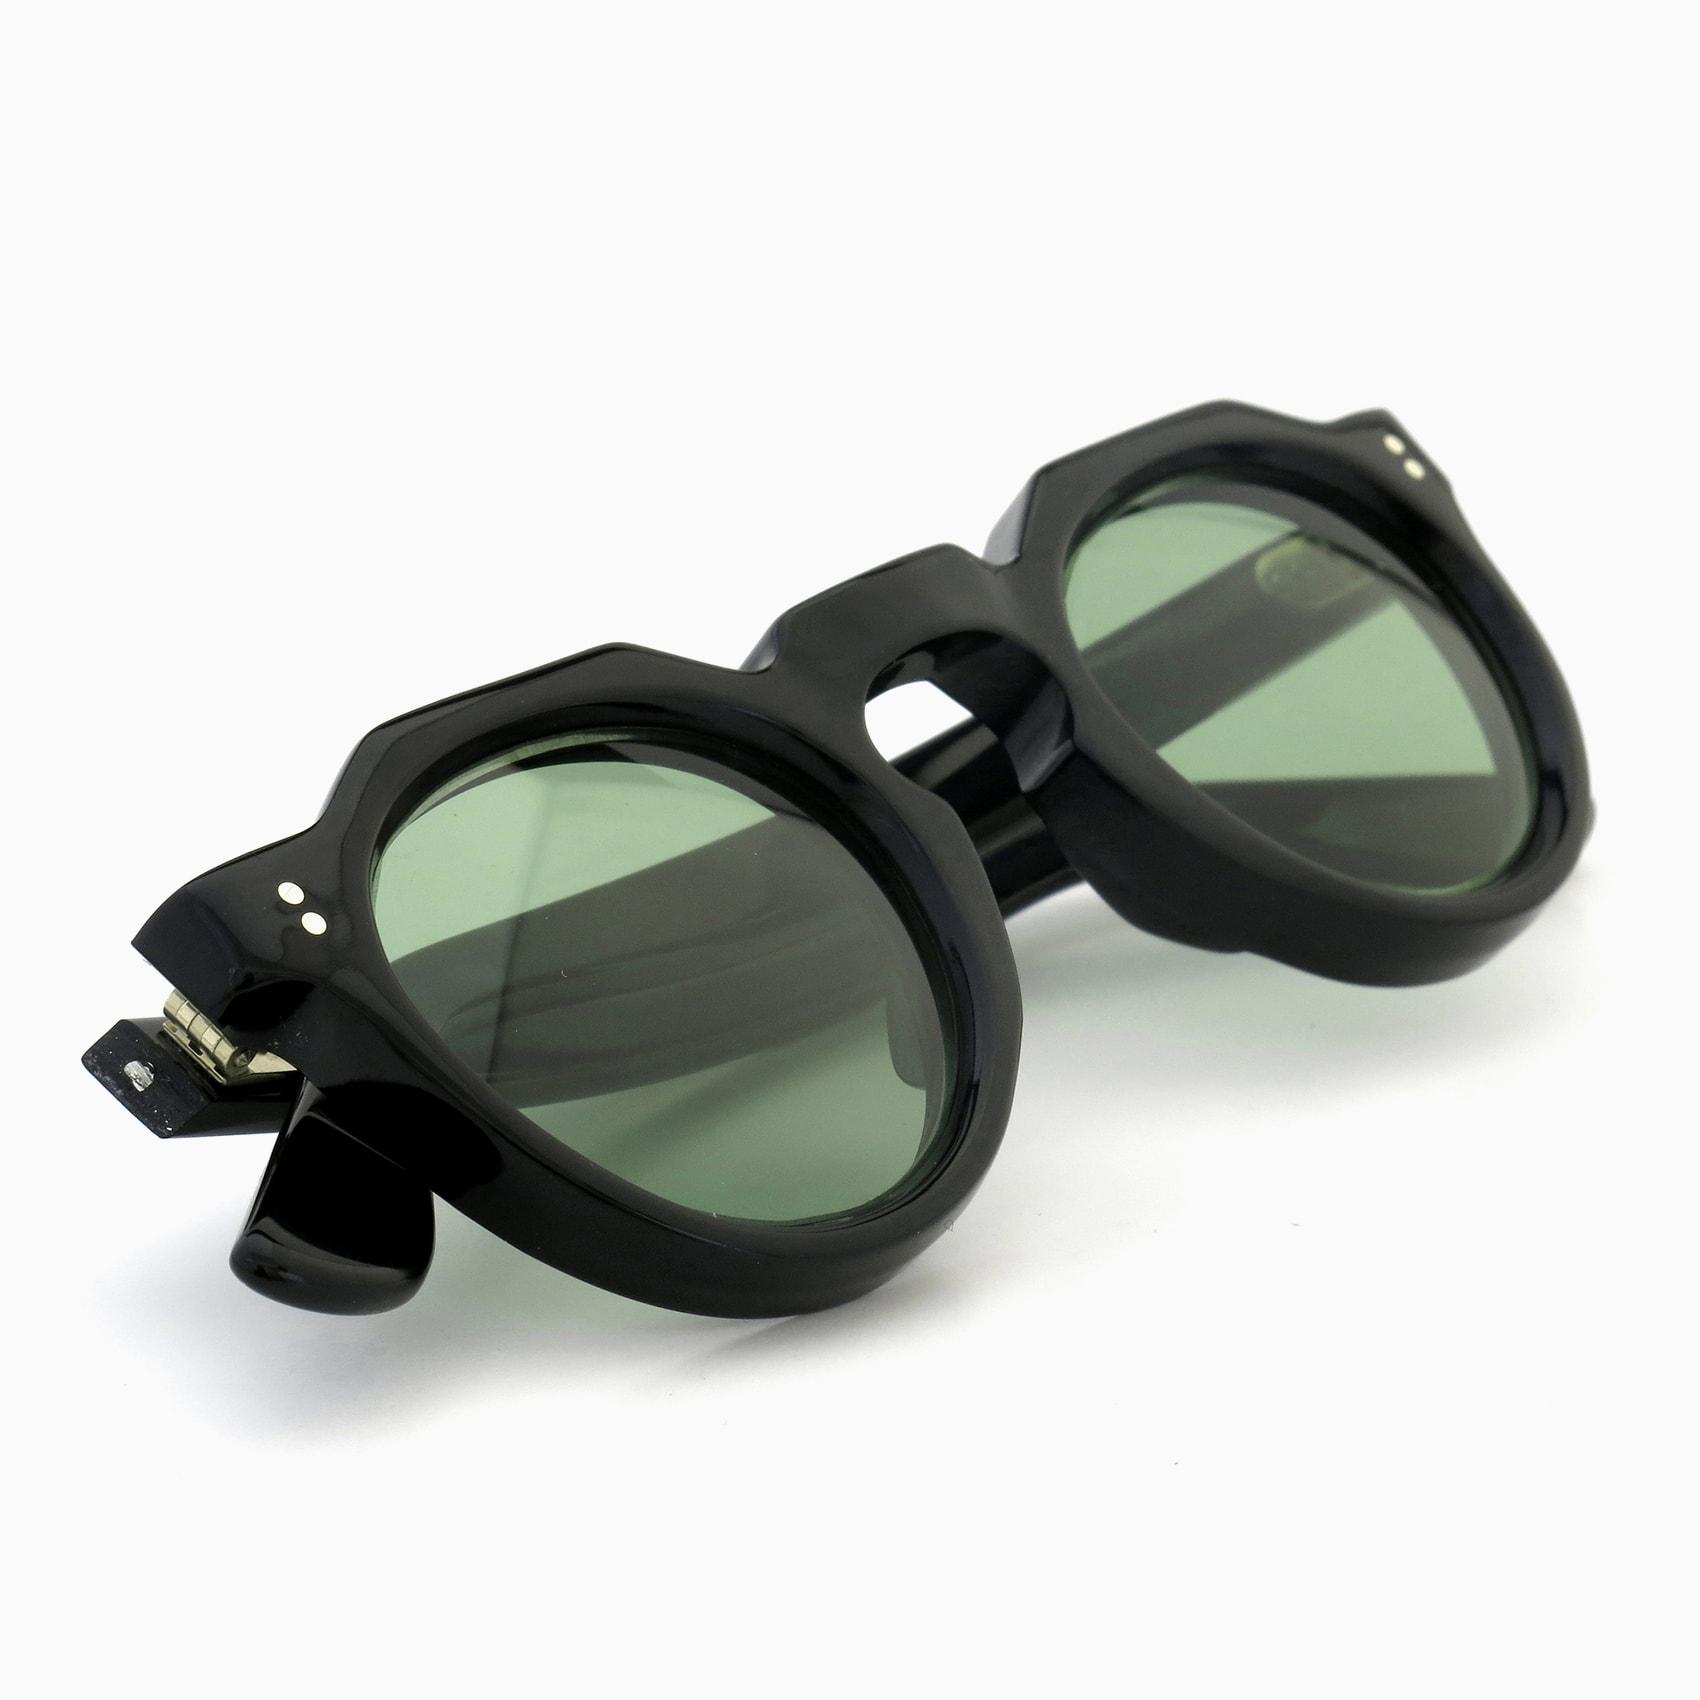 170530_Lesca-vintage_crowne-panto-type-a_Black_8mm_v13_Light-Green-lense_2pin